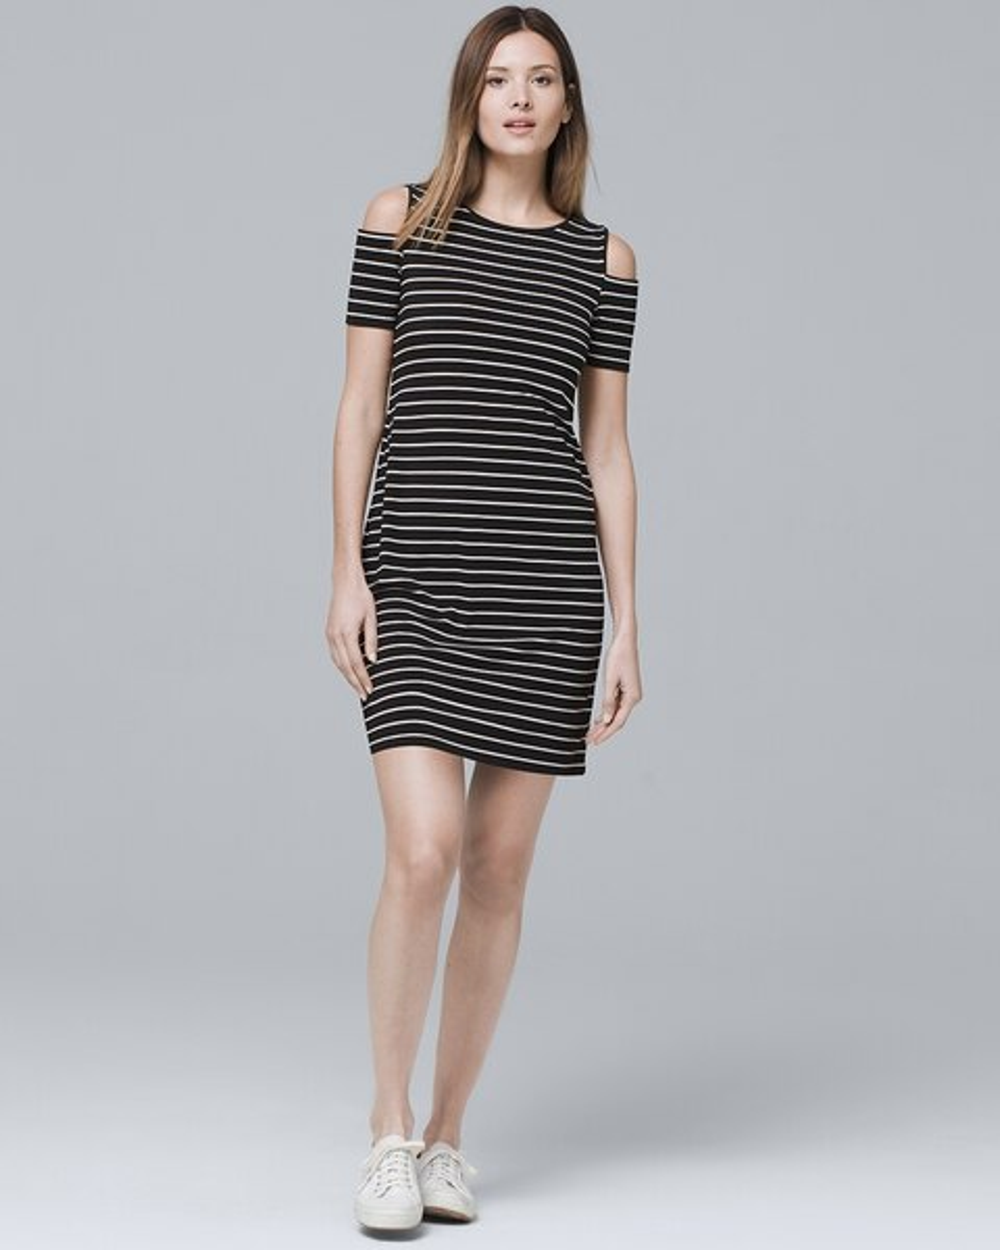 be3a7d773 Cold Shoulder Stripe Knit Shift Dress - White House Black Market